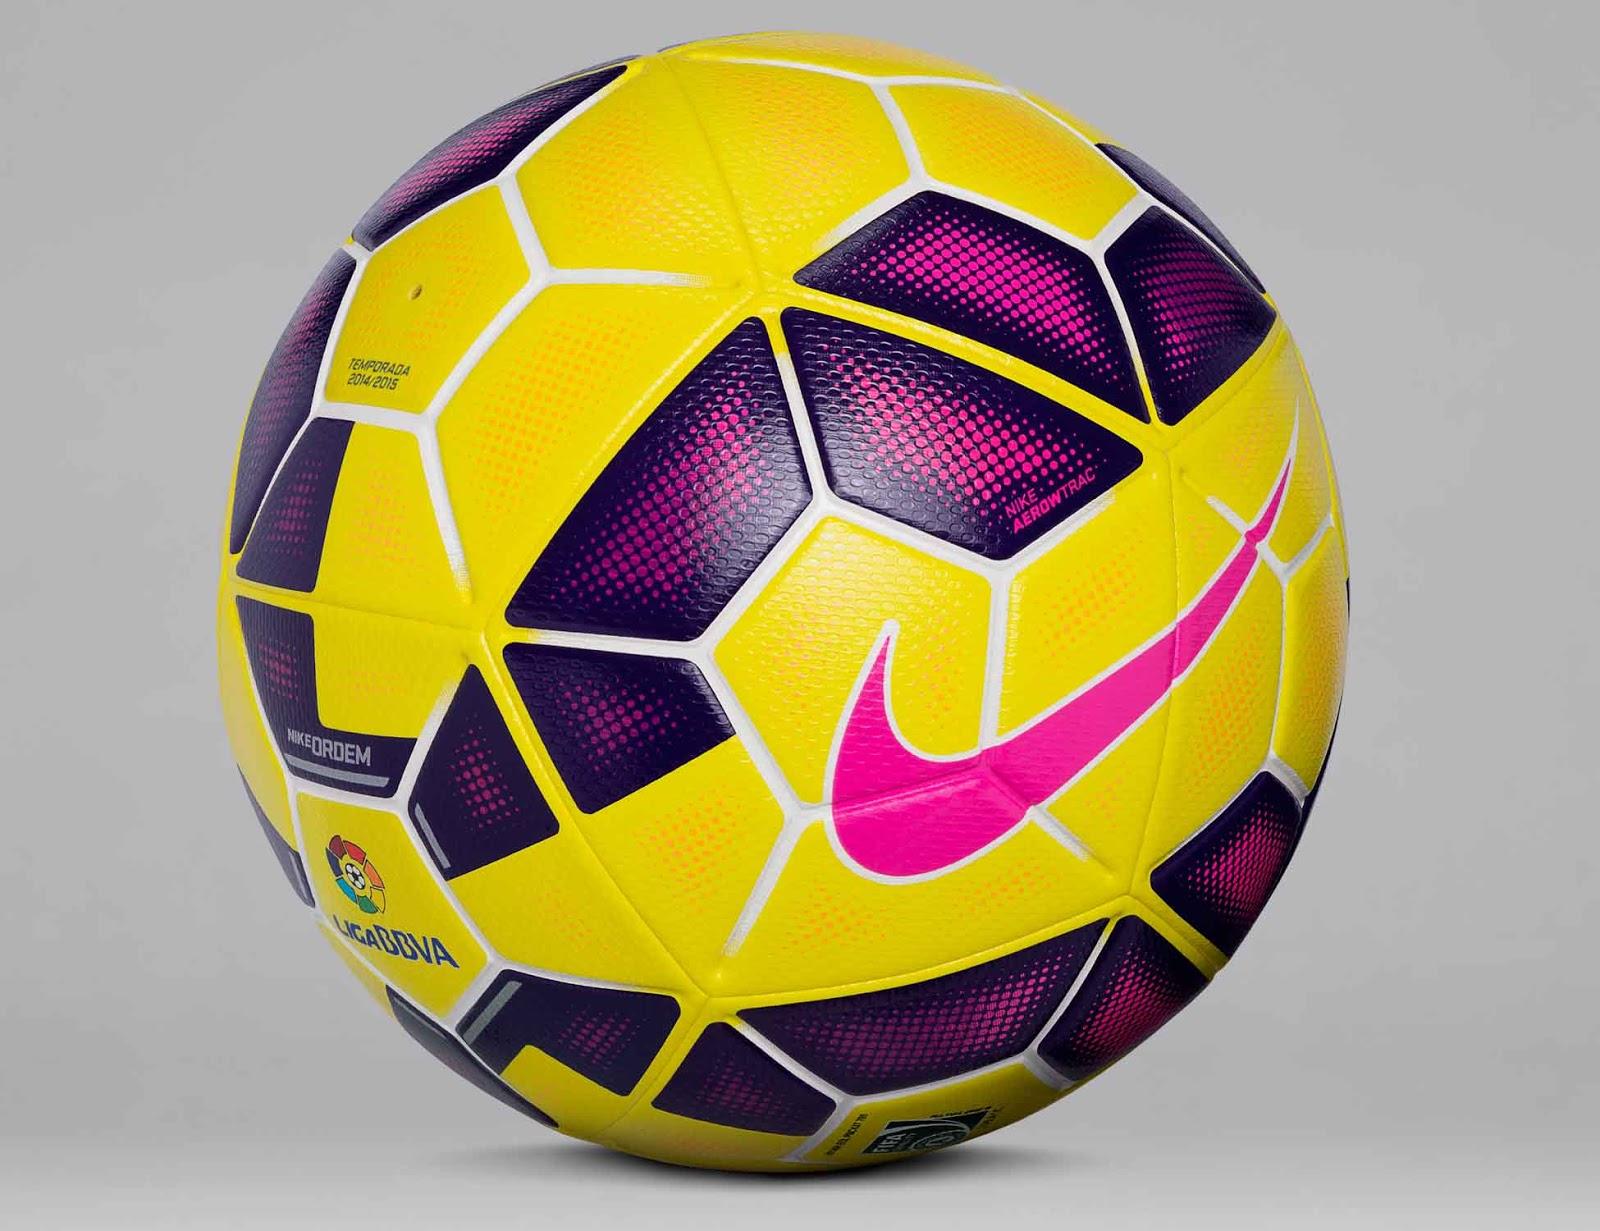 Spanische League